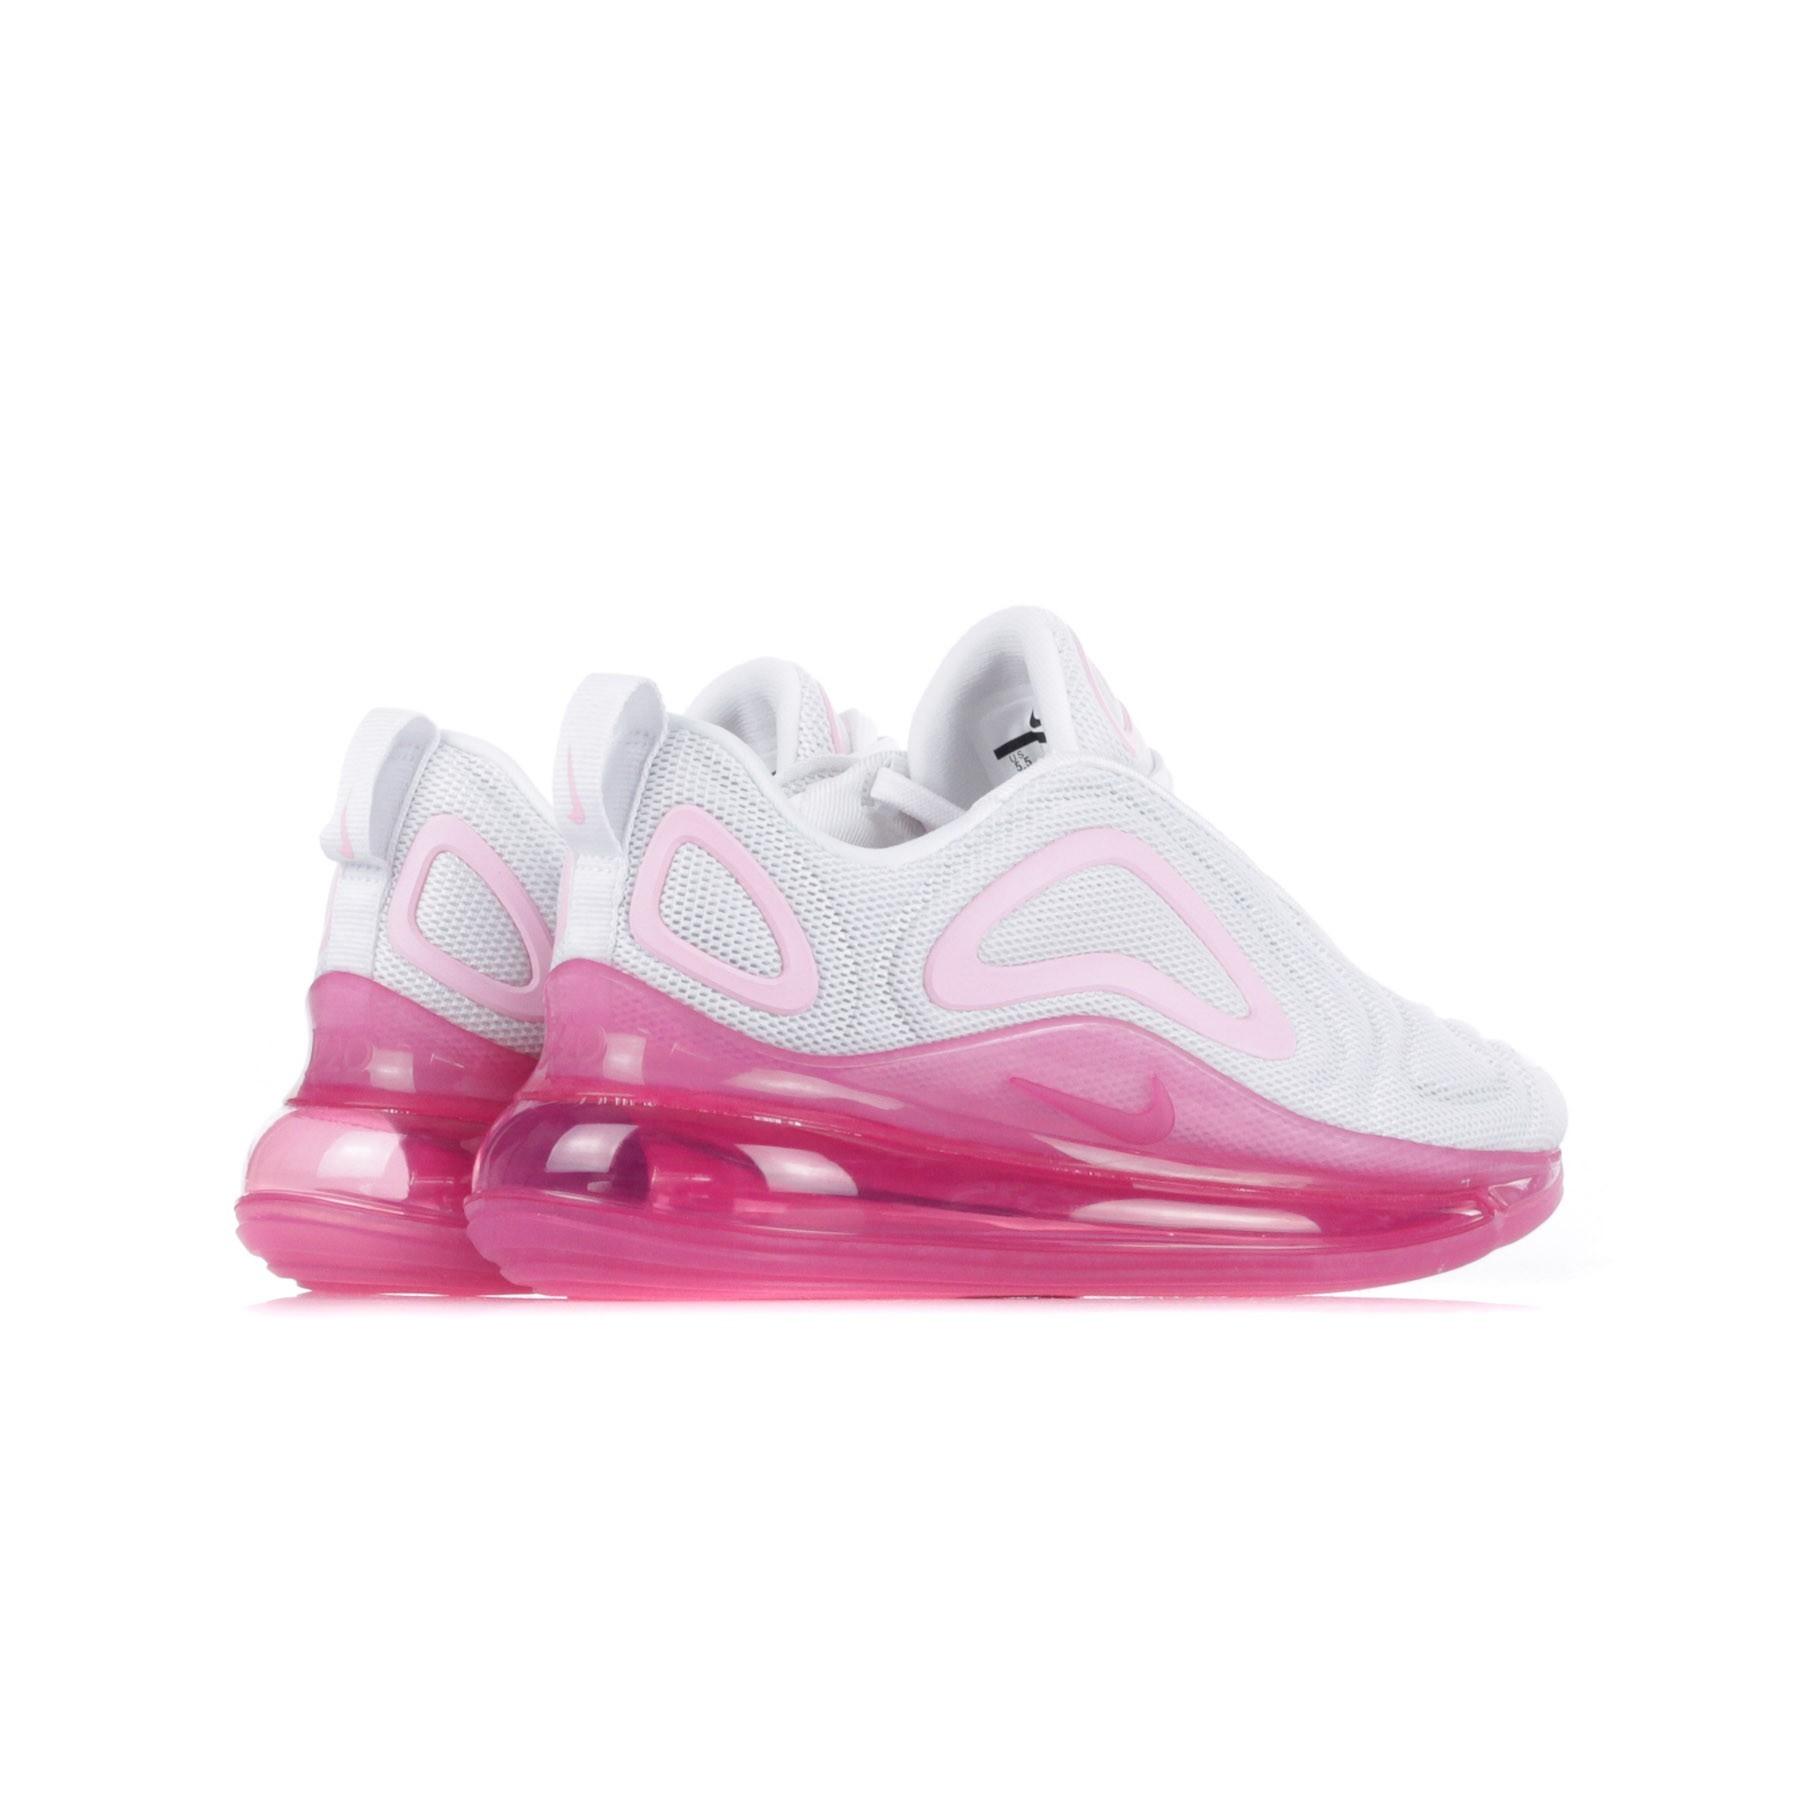 scarpe nike air max donna fucsia